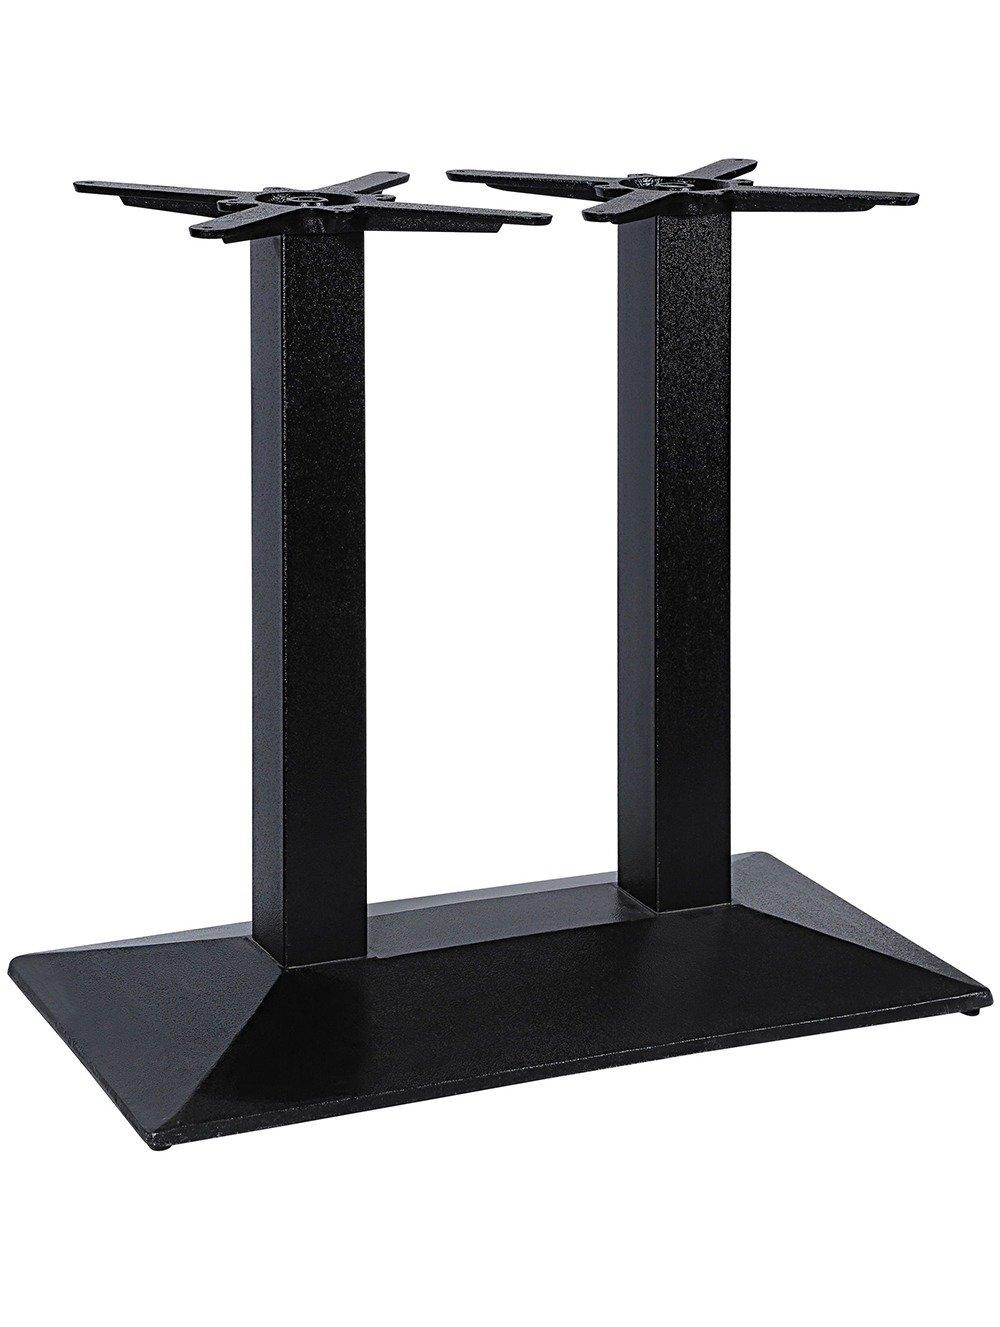 Pyramid twin pedestal